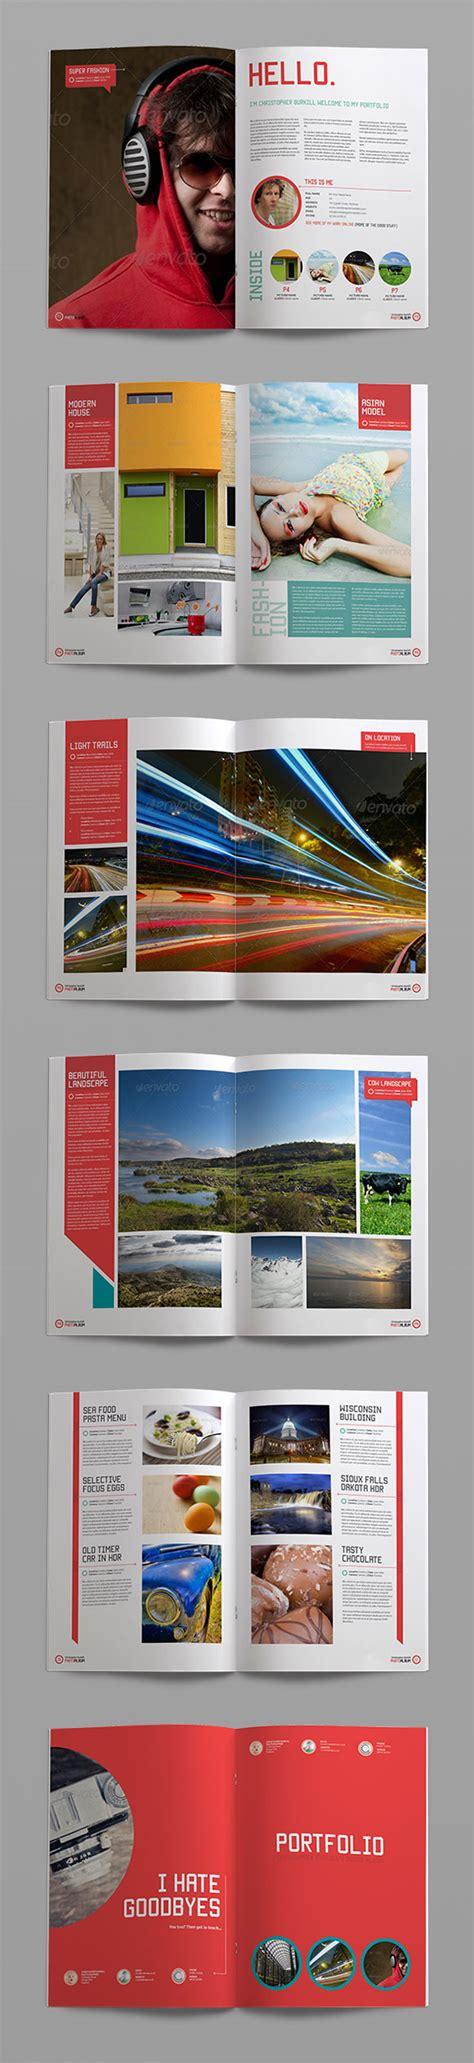 template indesign portfolio free sleek photo album indesign portfolio template crs